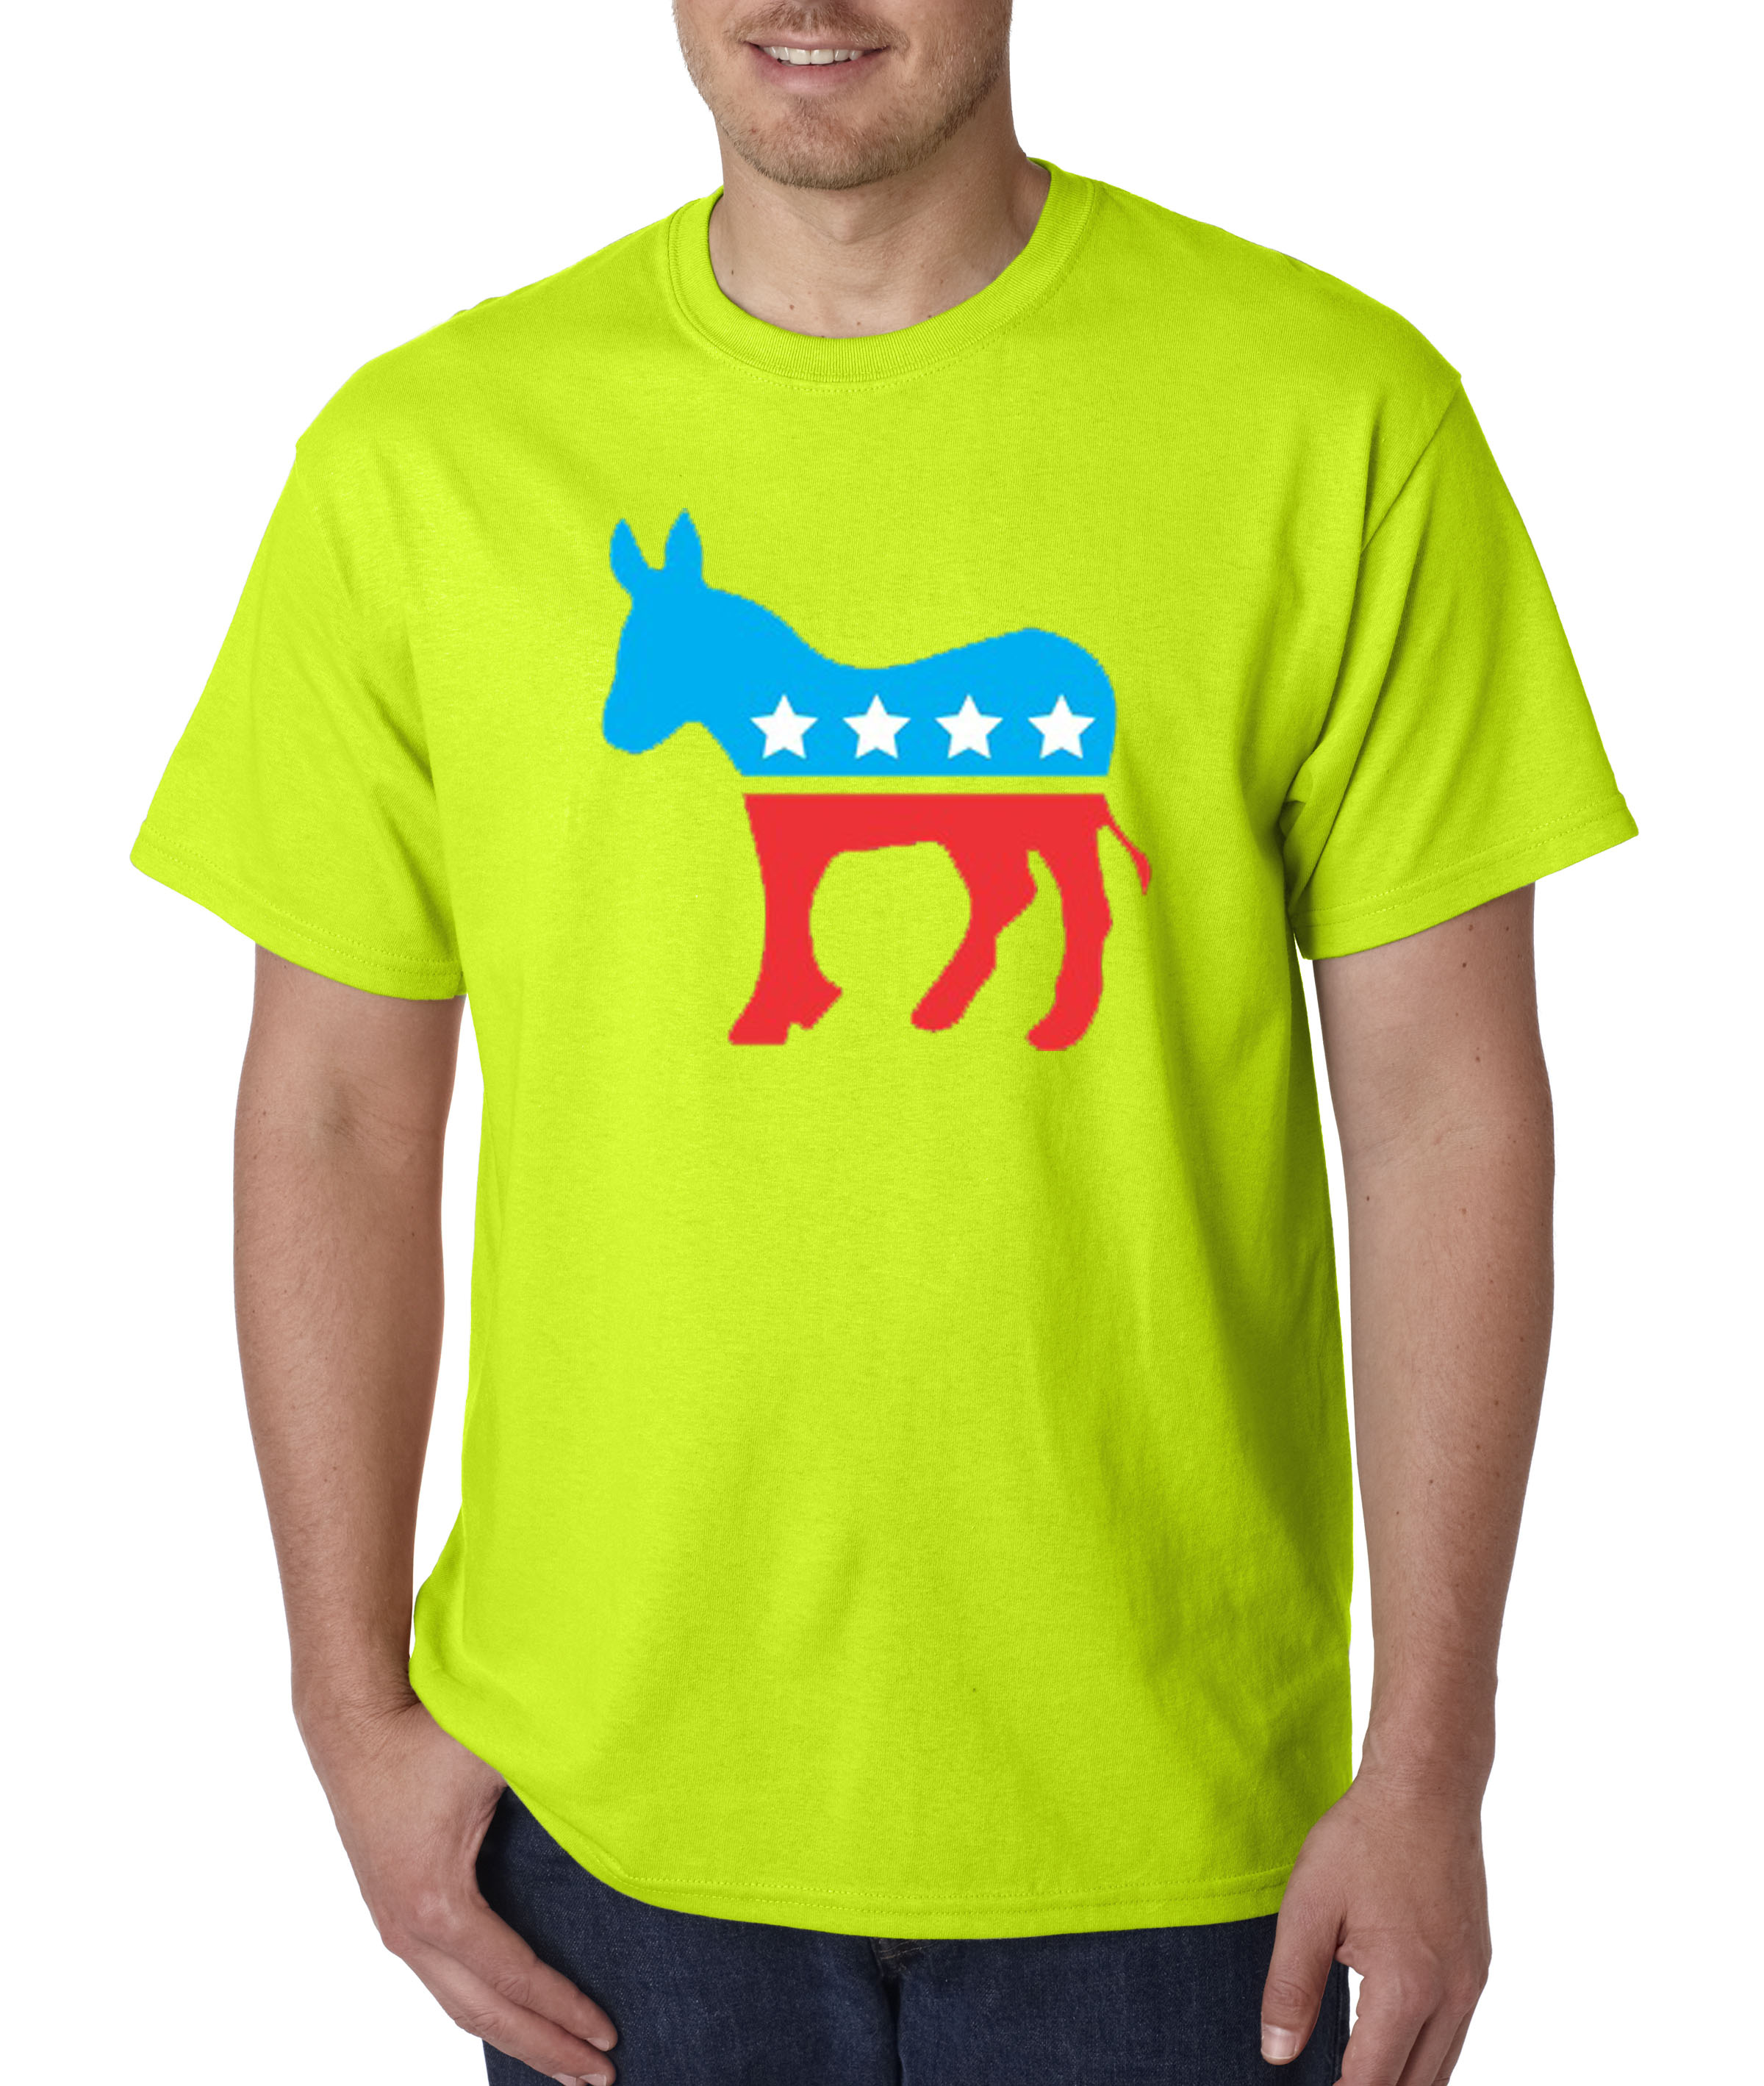 1011 - Unisex T-Shirt Democrat Donkey Mascot Liberal ...